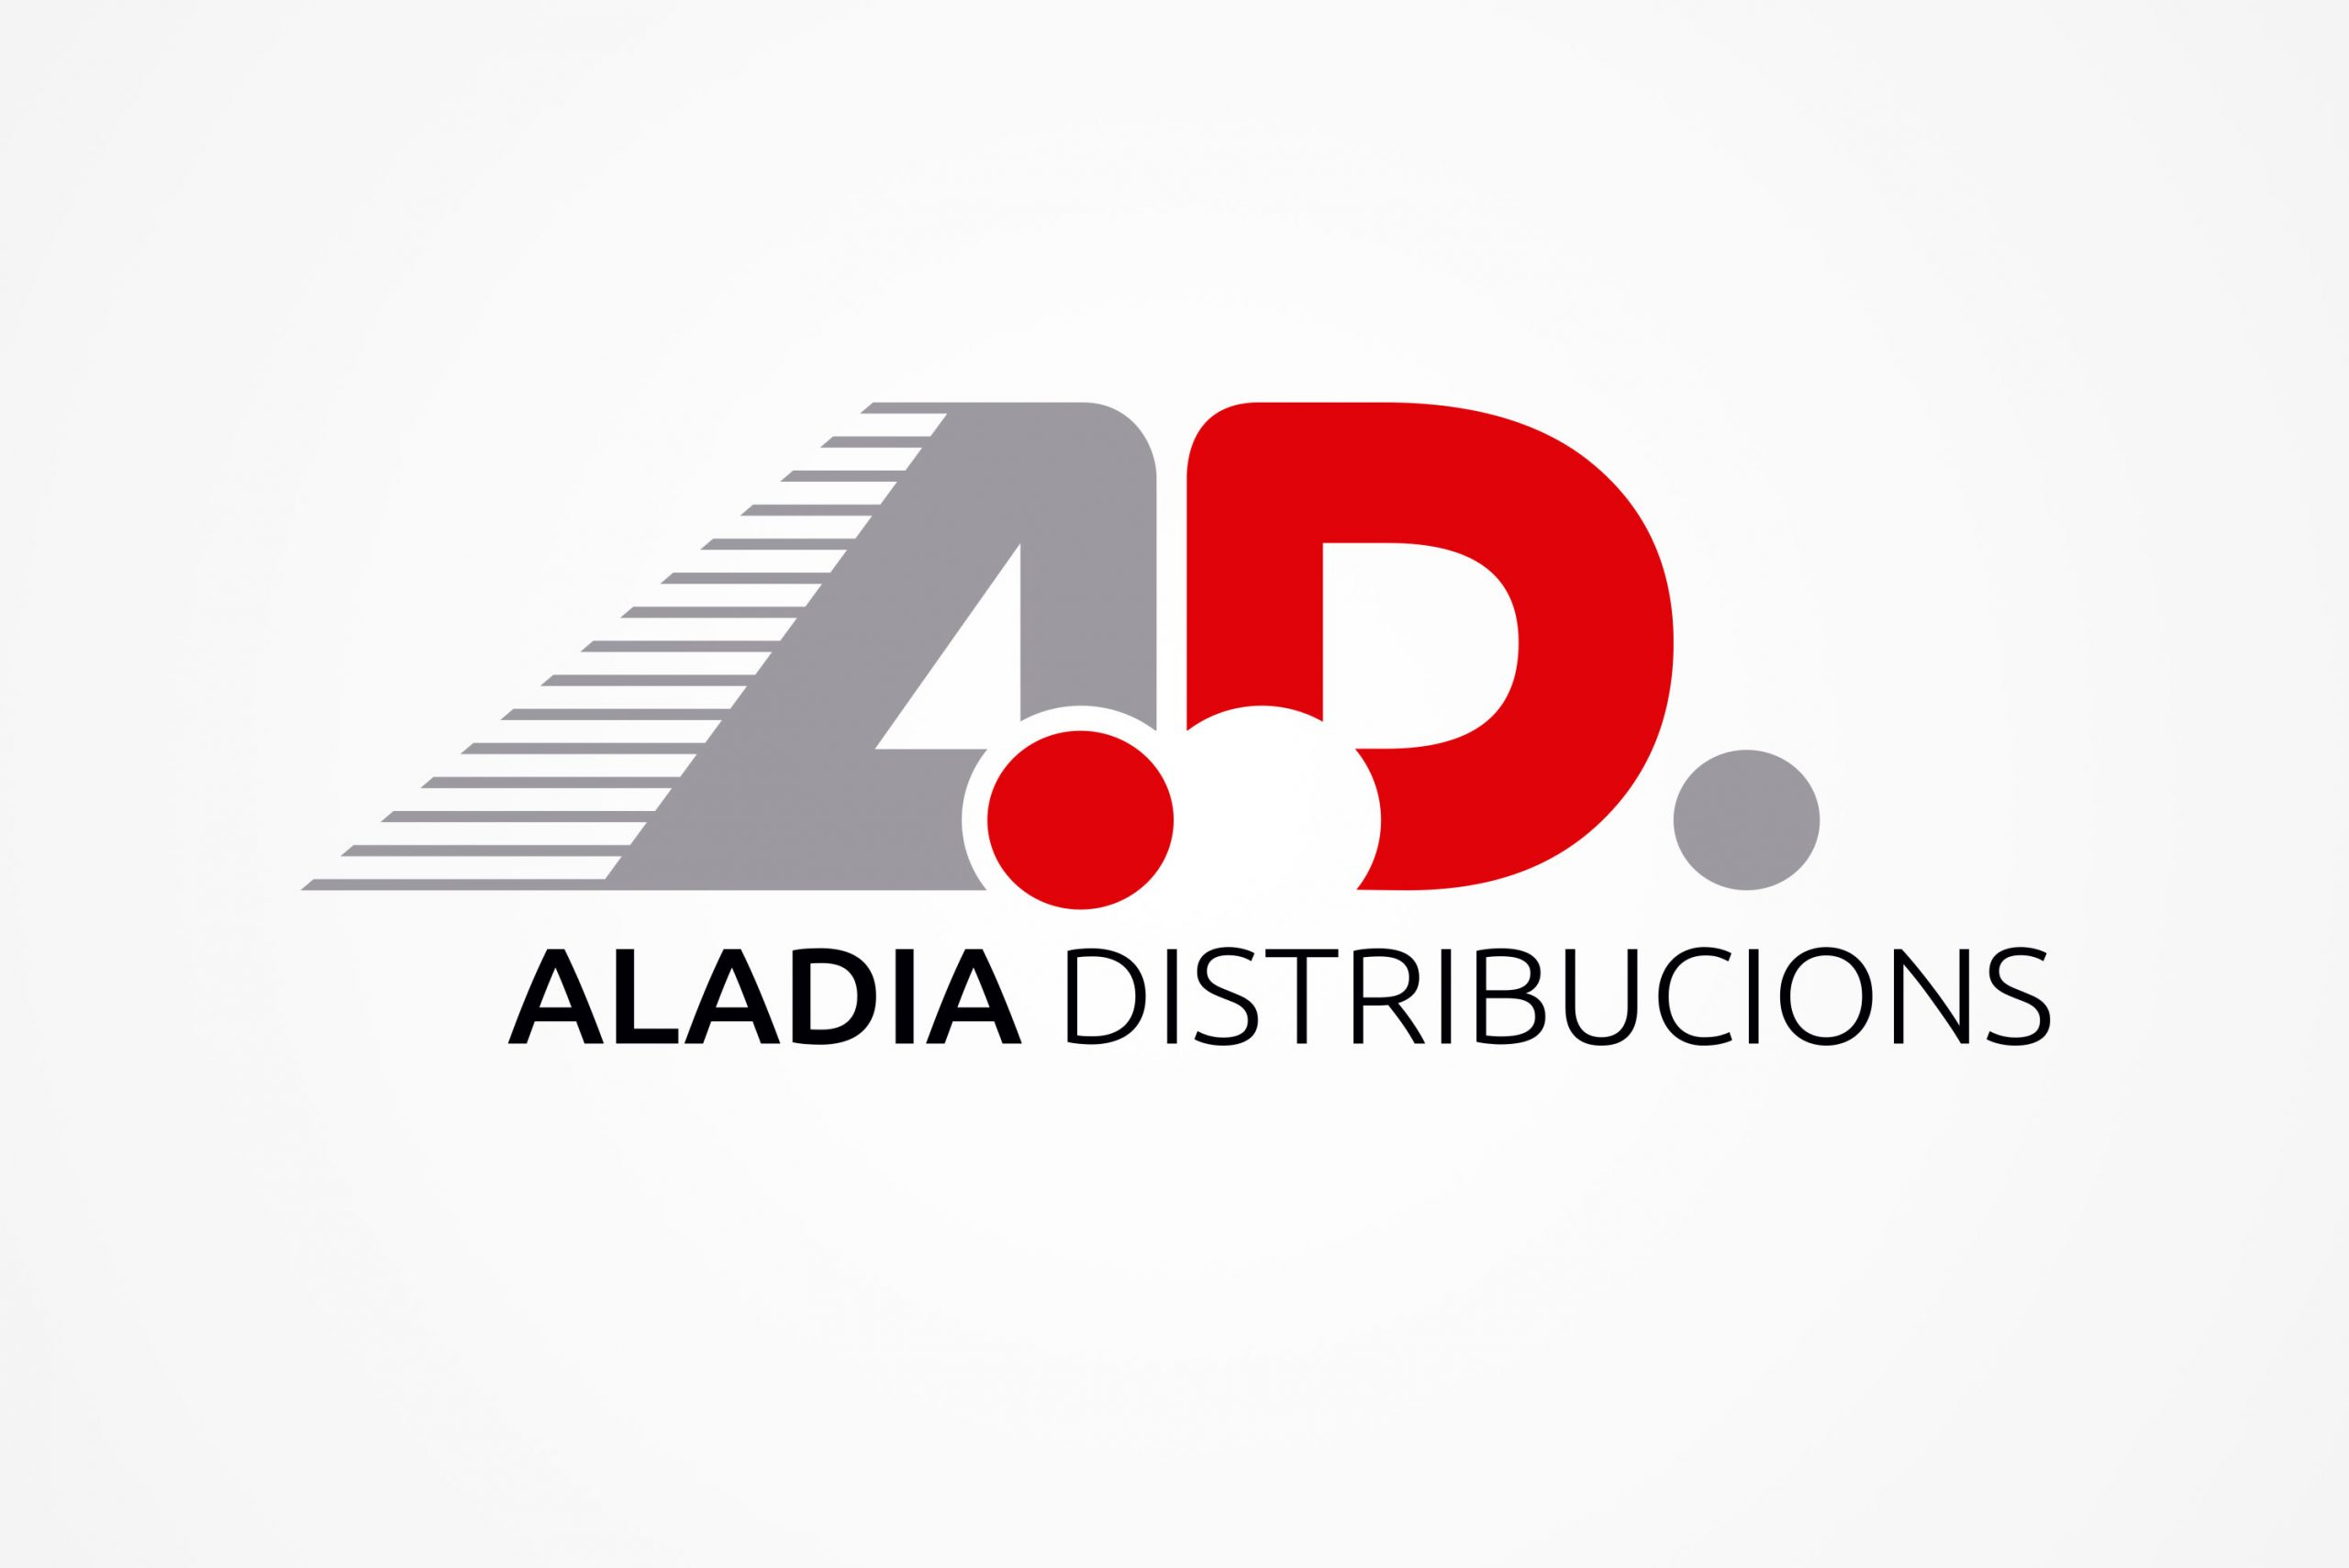 aladia